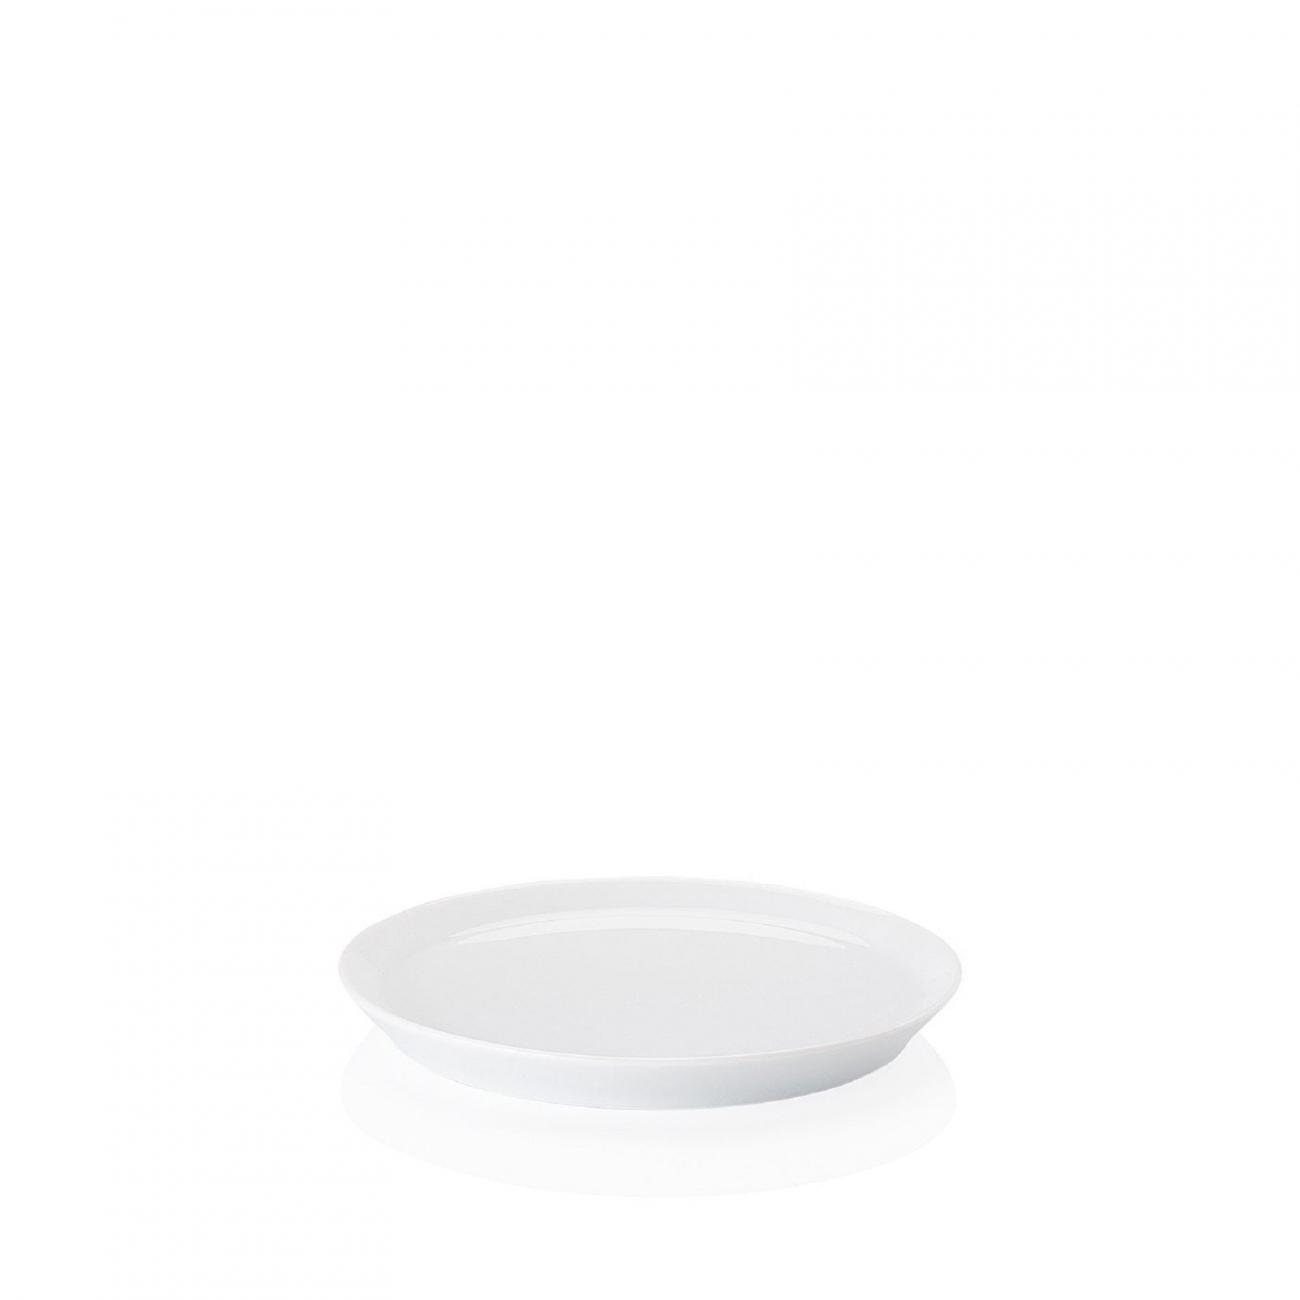 Arzberg Tric Rim Plate